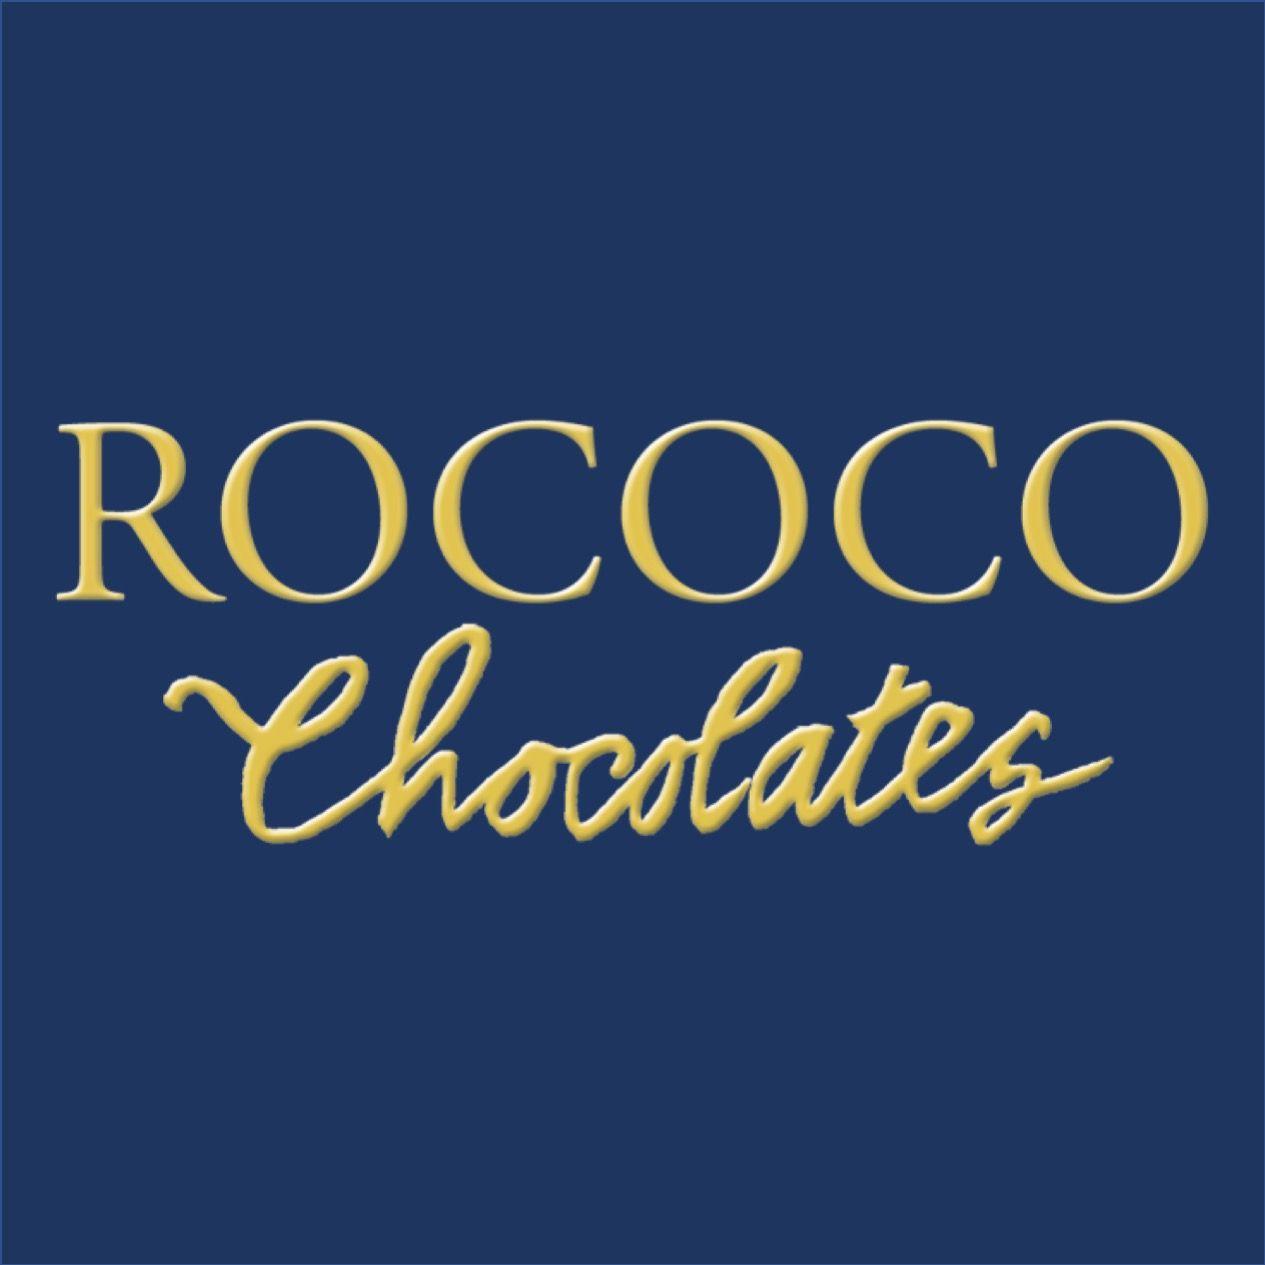 Rococo Chocolates London Limited